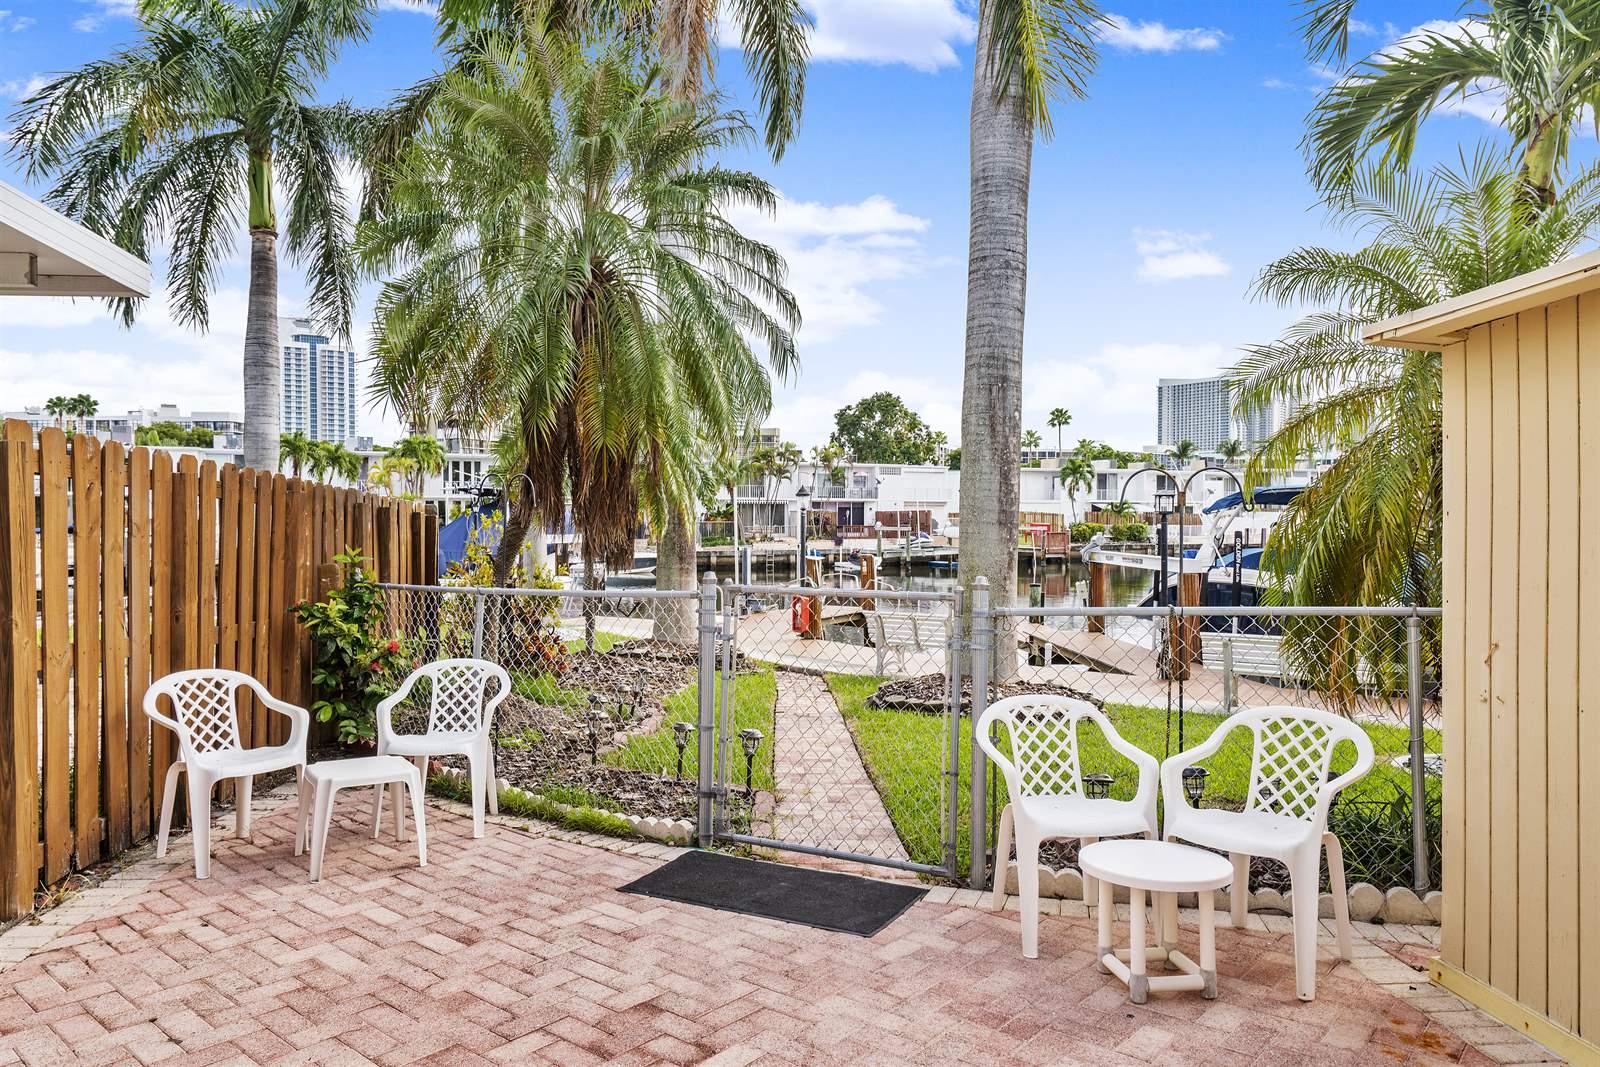 814 NE 25th Ave, #64, Hallandale Beach, FL 33009